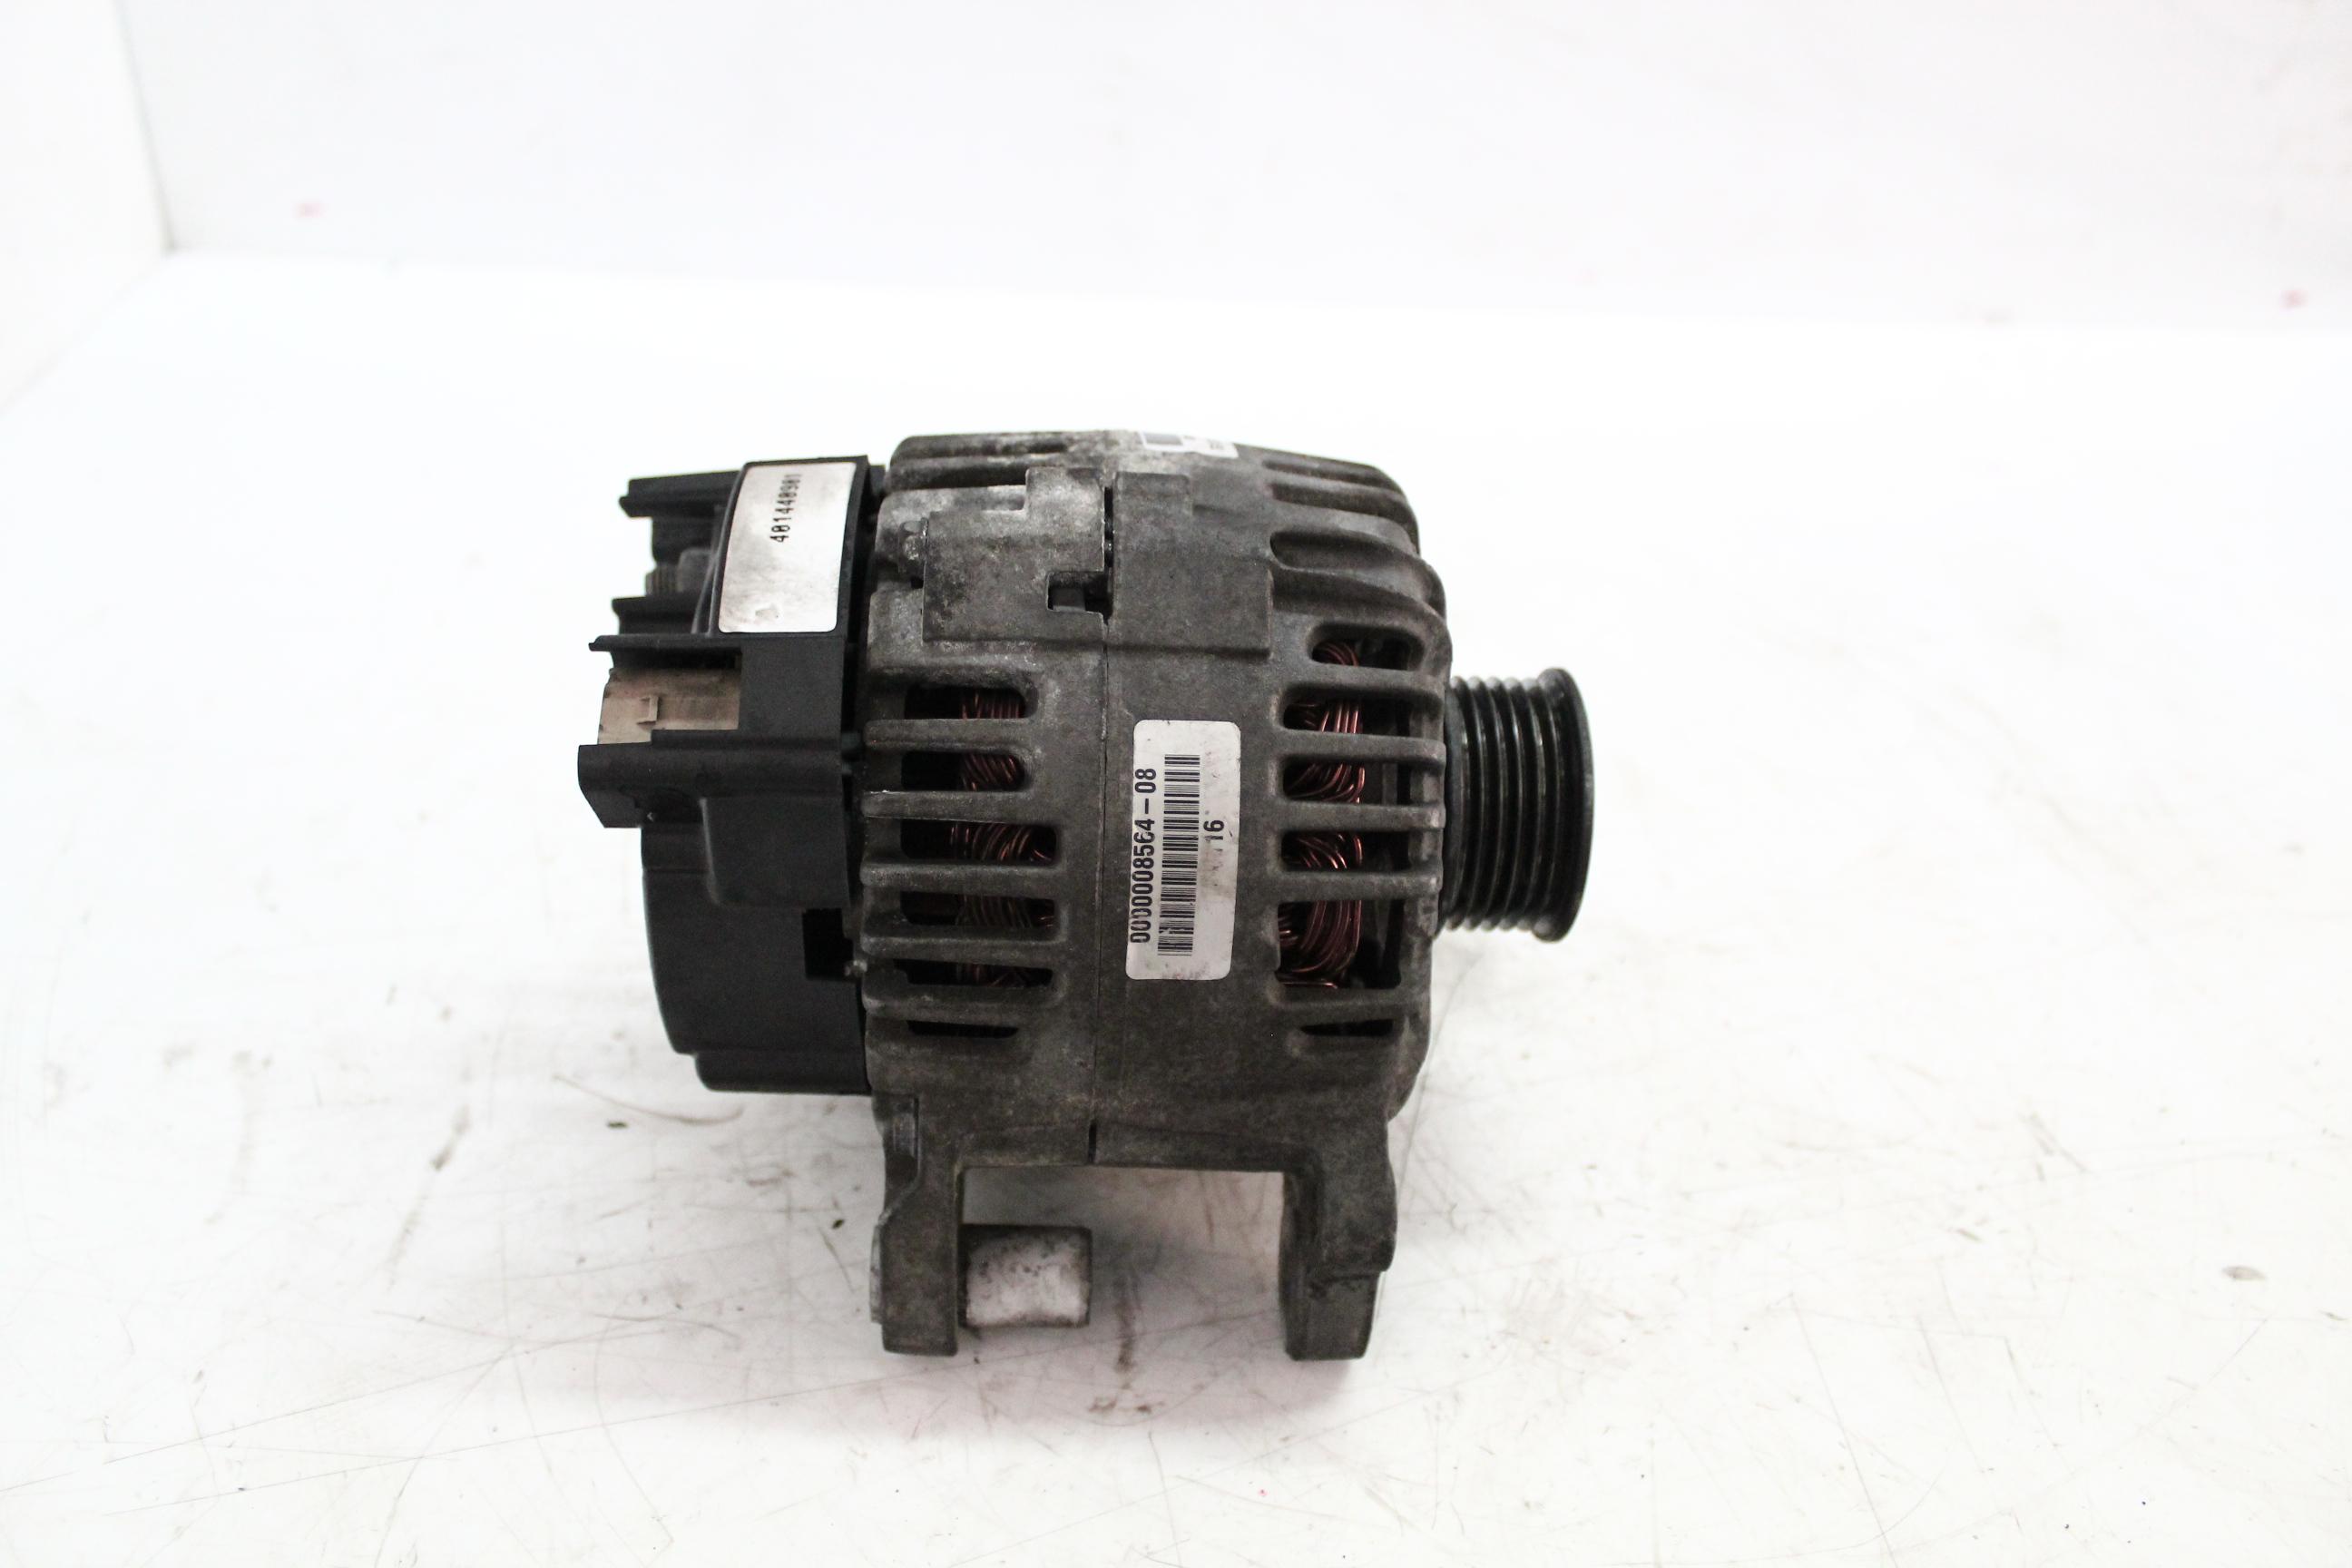 Lichtmaschine VW Polo 9N 1,4 FSI Benzin AXU TG11L015